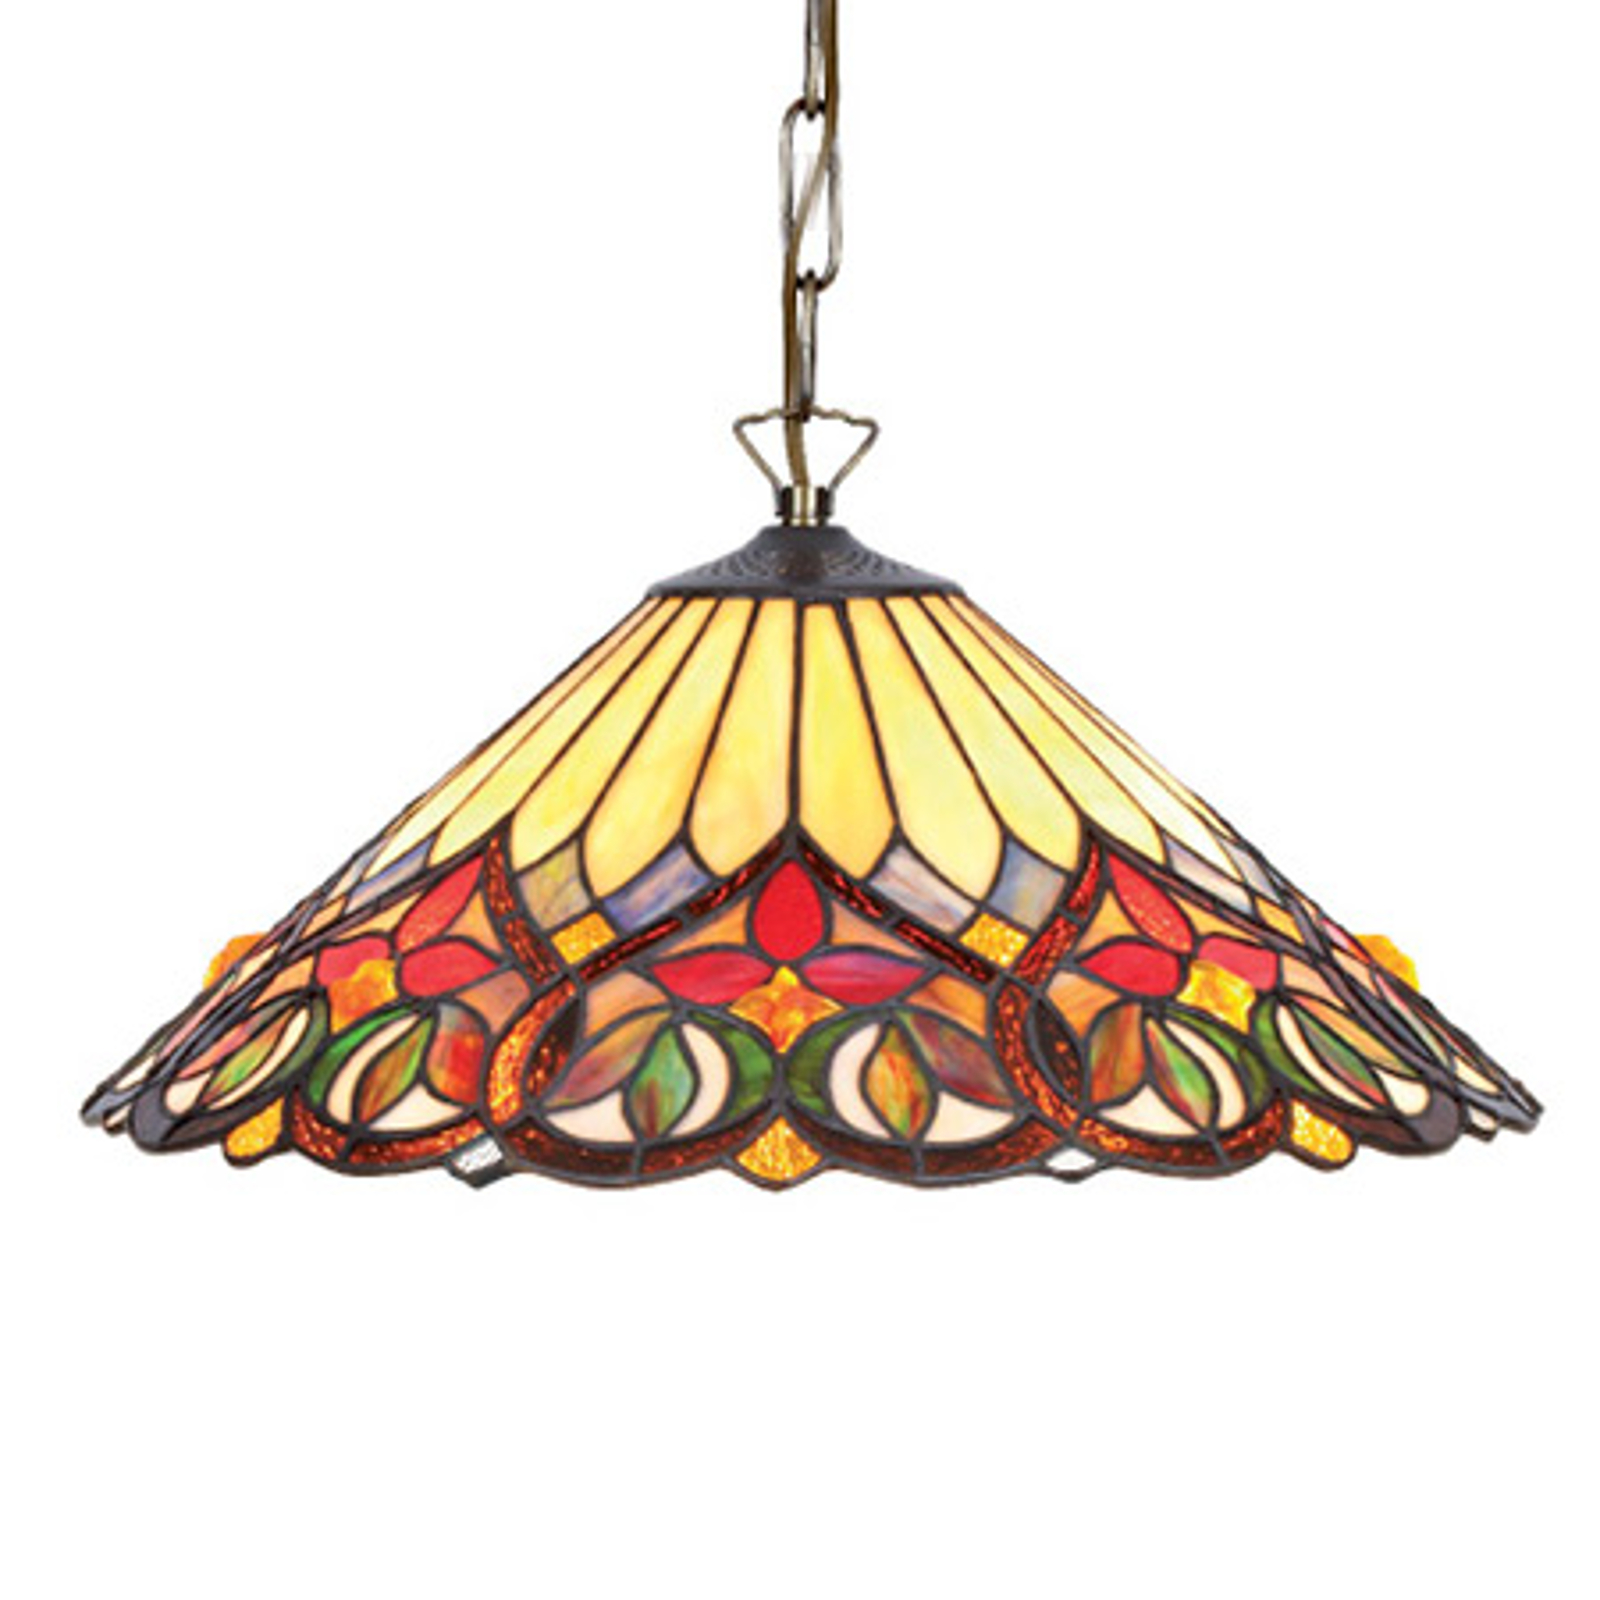 Bonte glazen hanglamp Anni in Tiffany-stijl